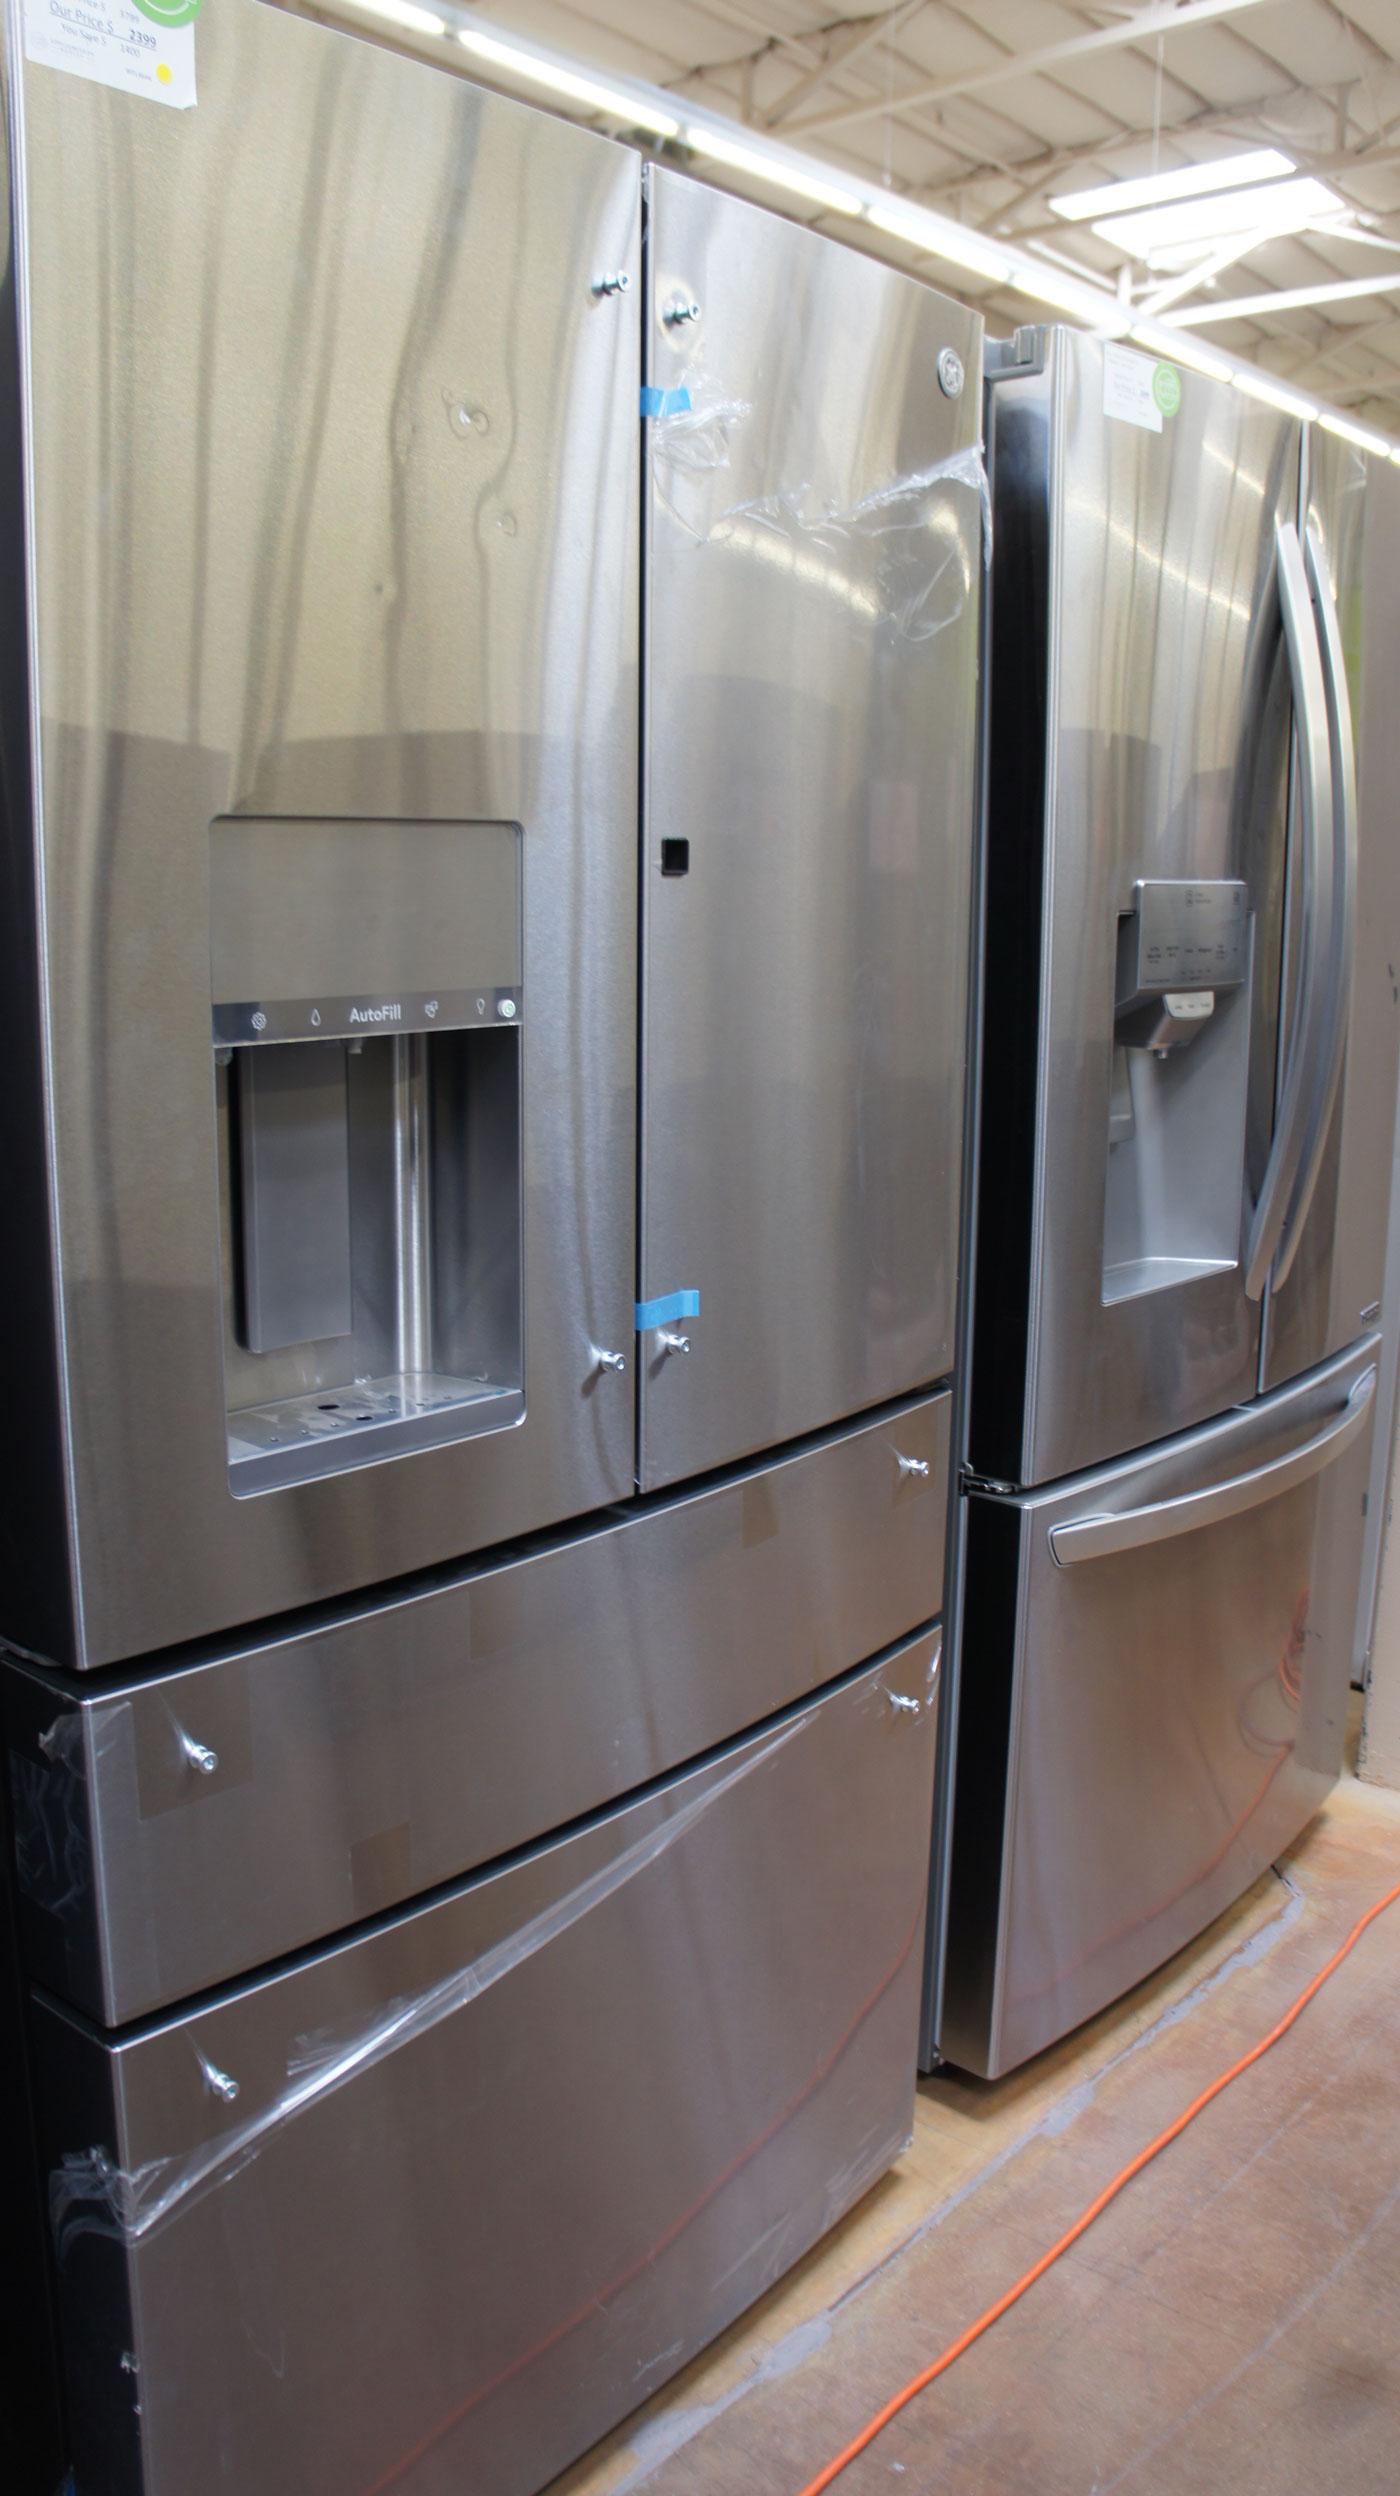 GE PVD28BYNFS French Door Refrigerator